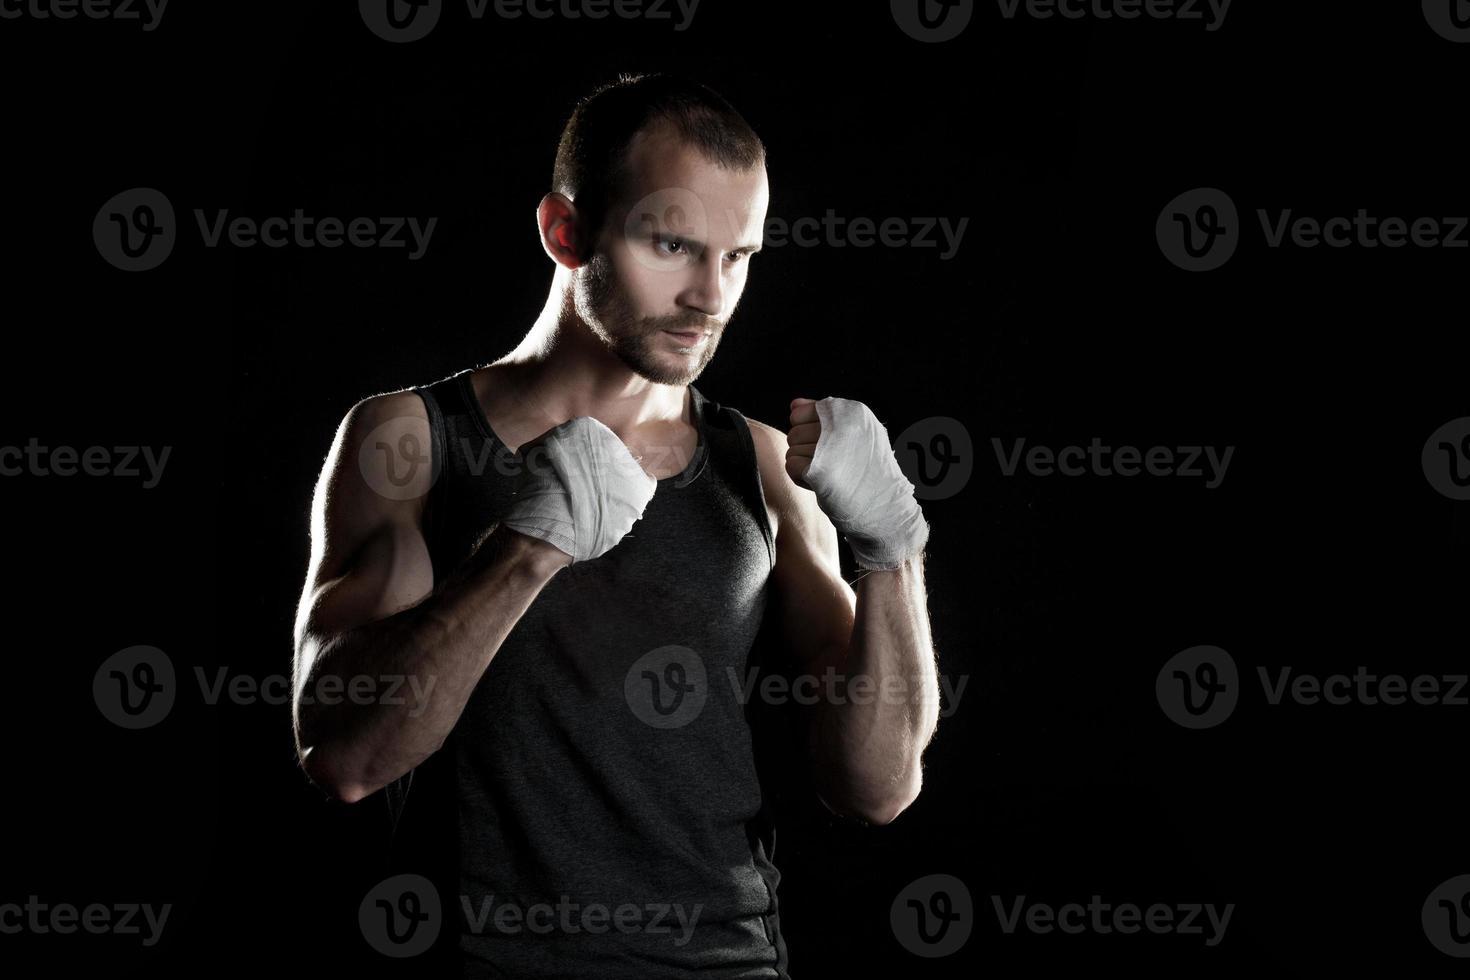 muskulös man, timmeboxare, svart bakgrund, horisontellt foto